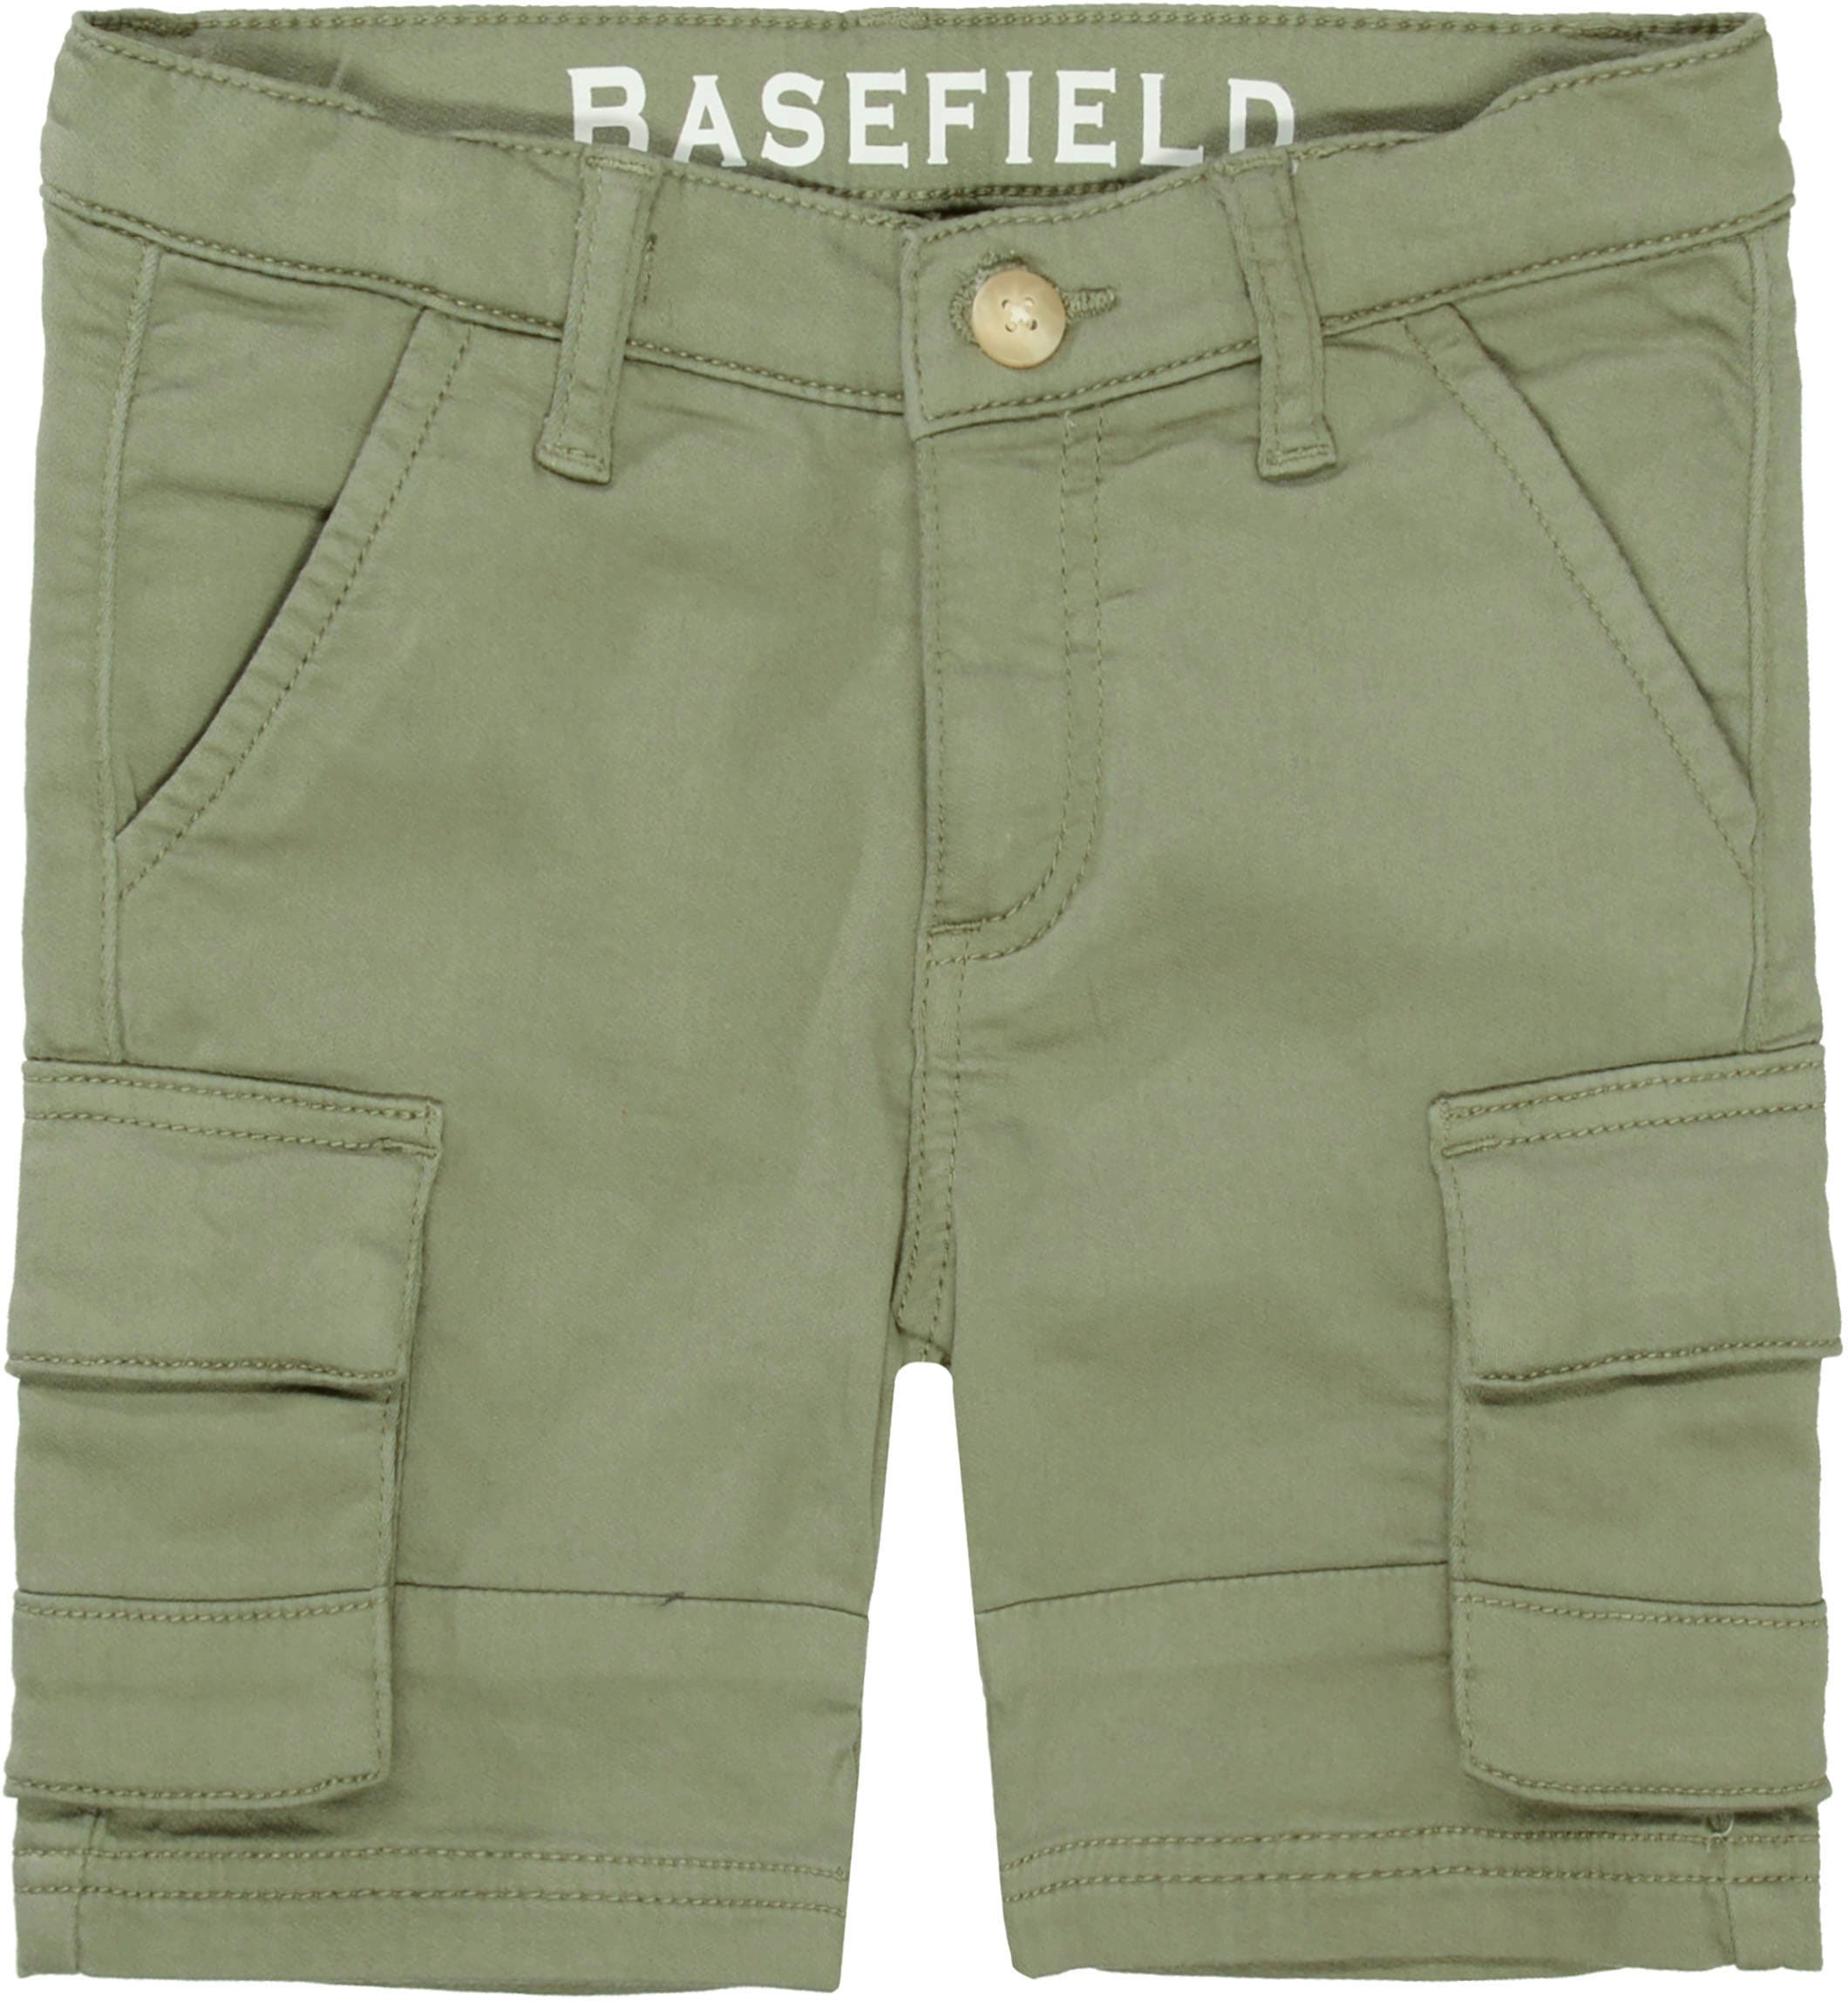 Image of BASEFIELD Cargobermudas